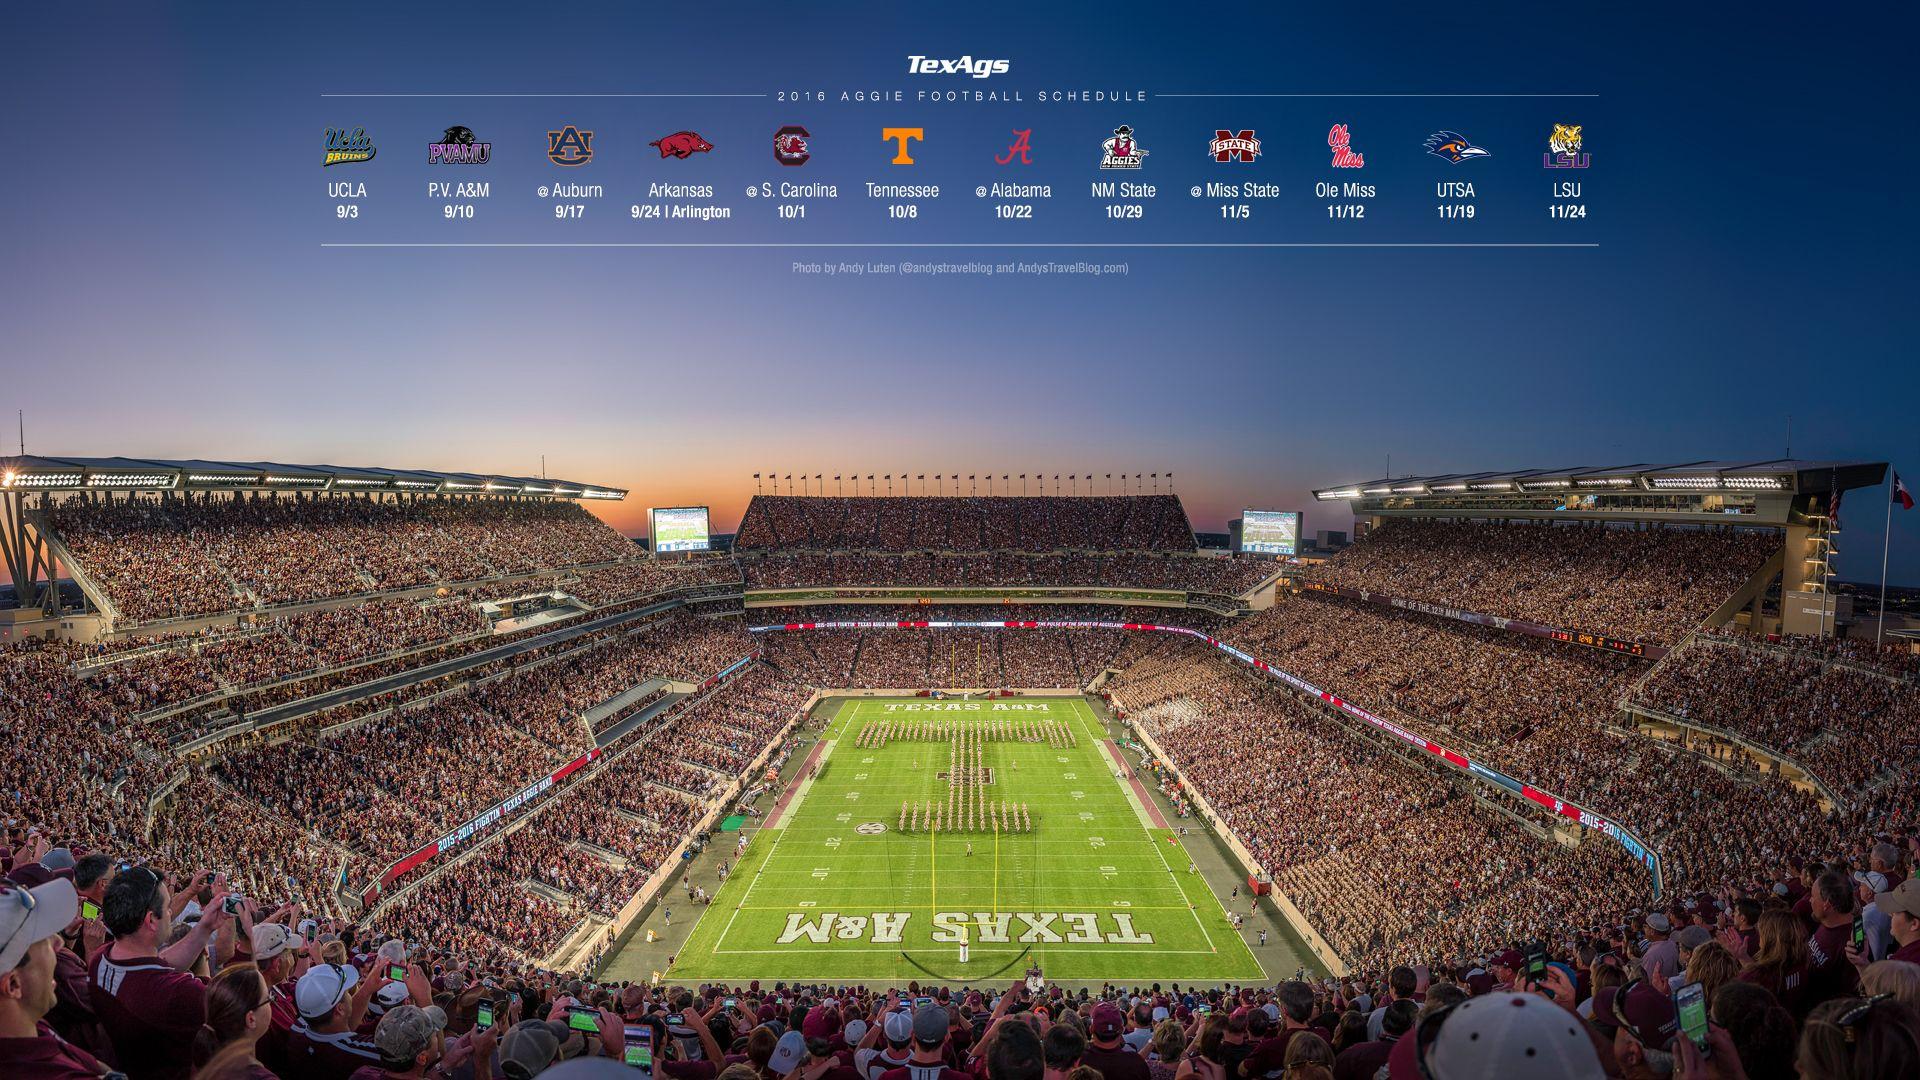 2016 Texas A M Football Wallpapers A M Football Football Wallpaper Texas A M Football